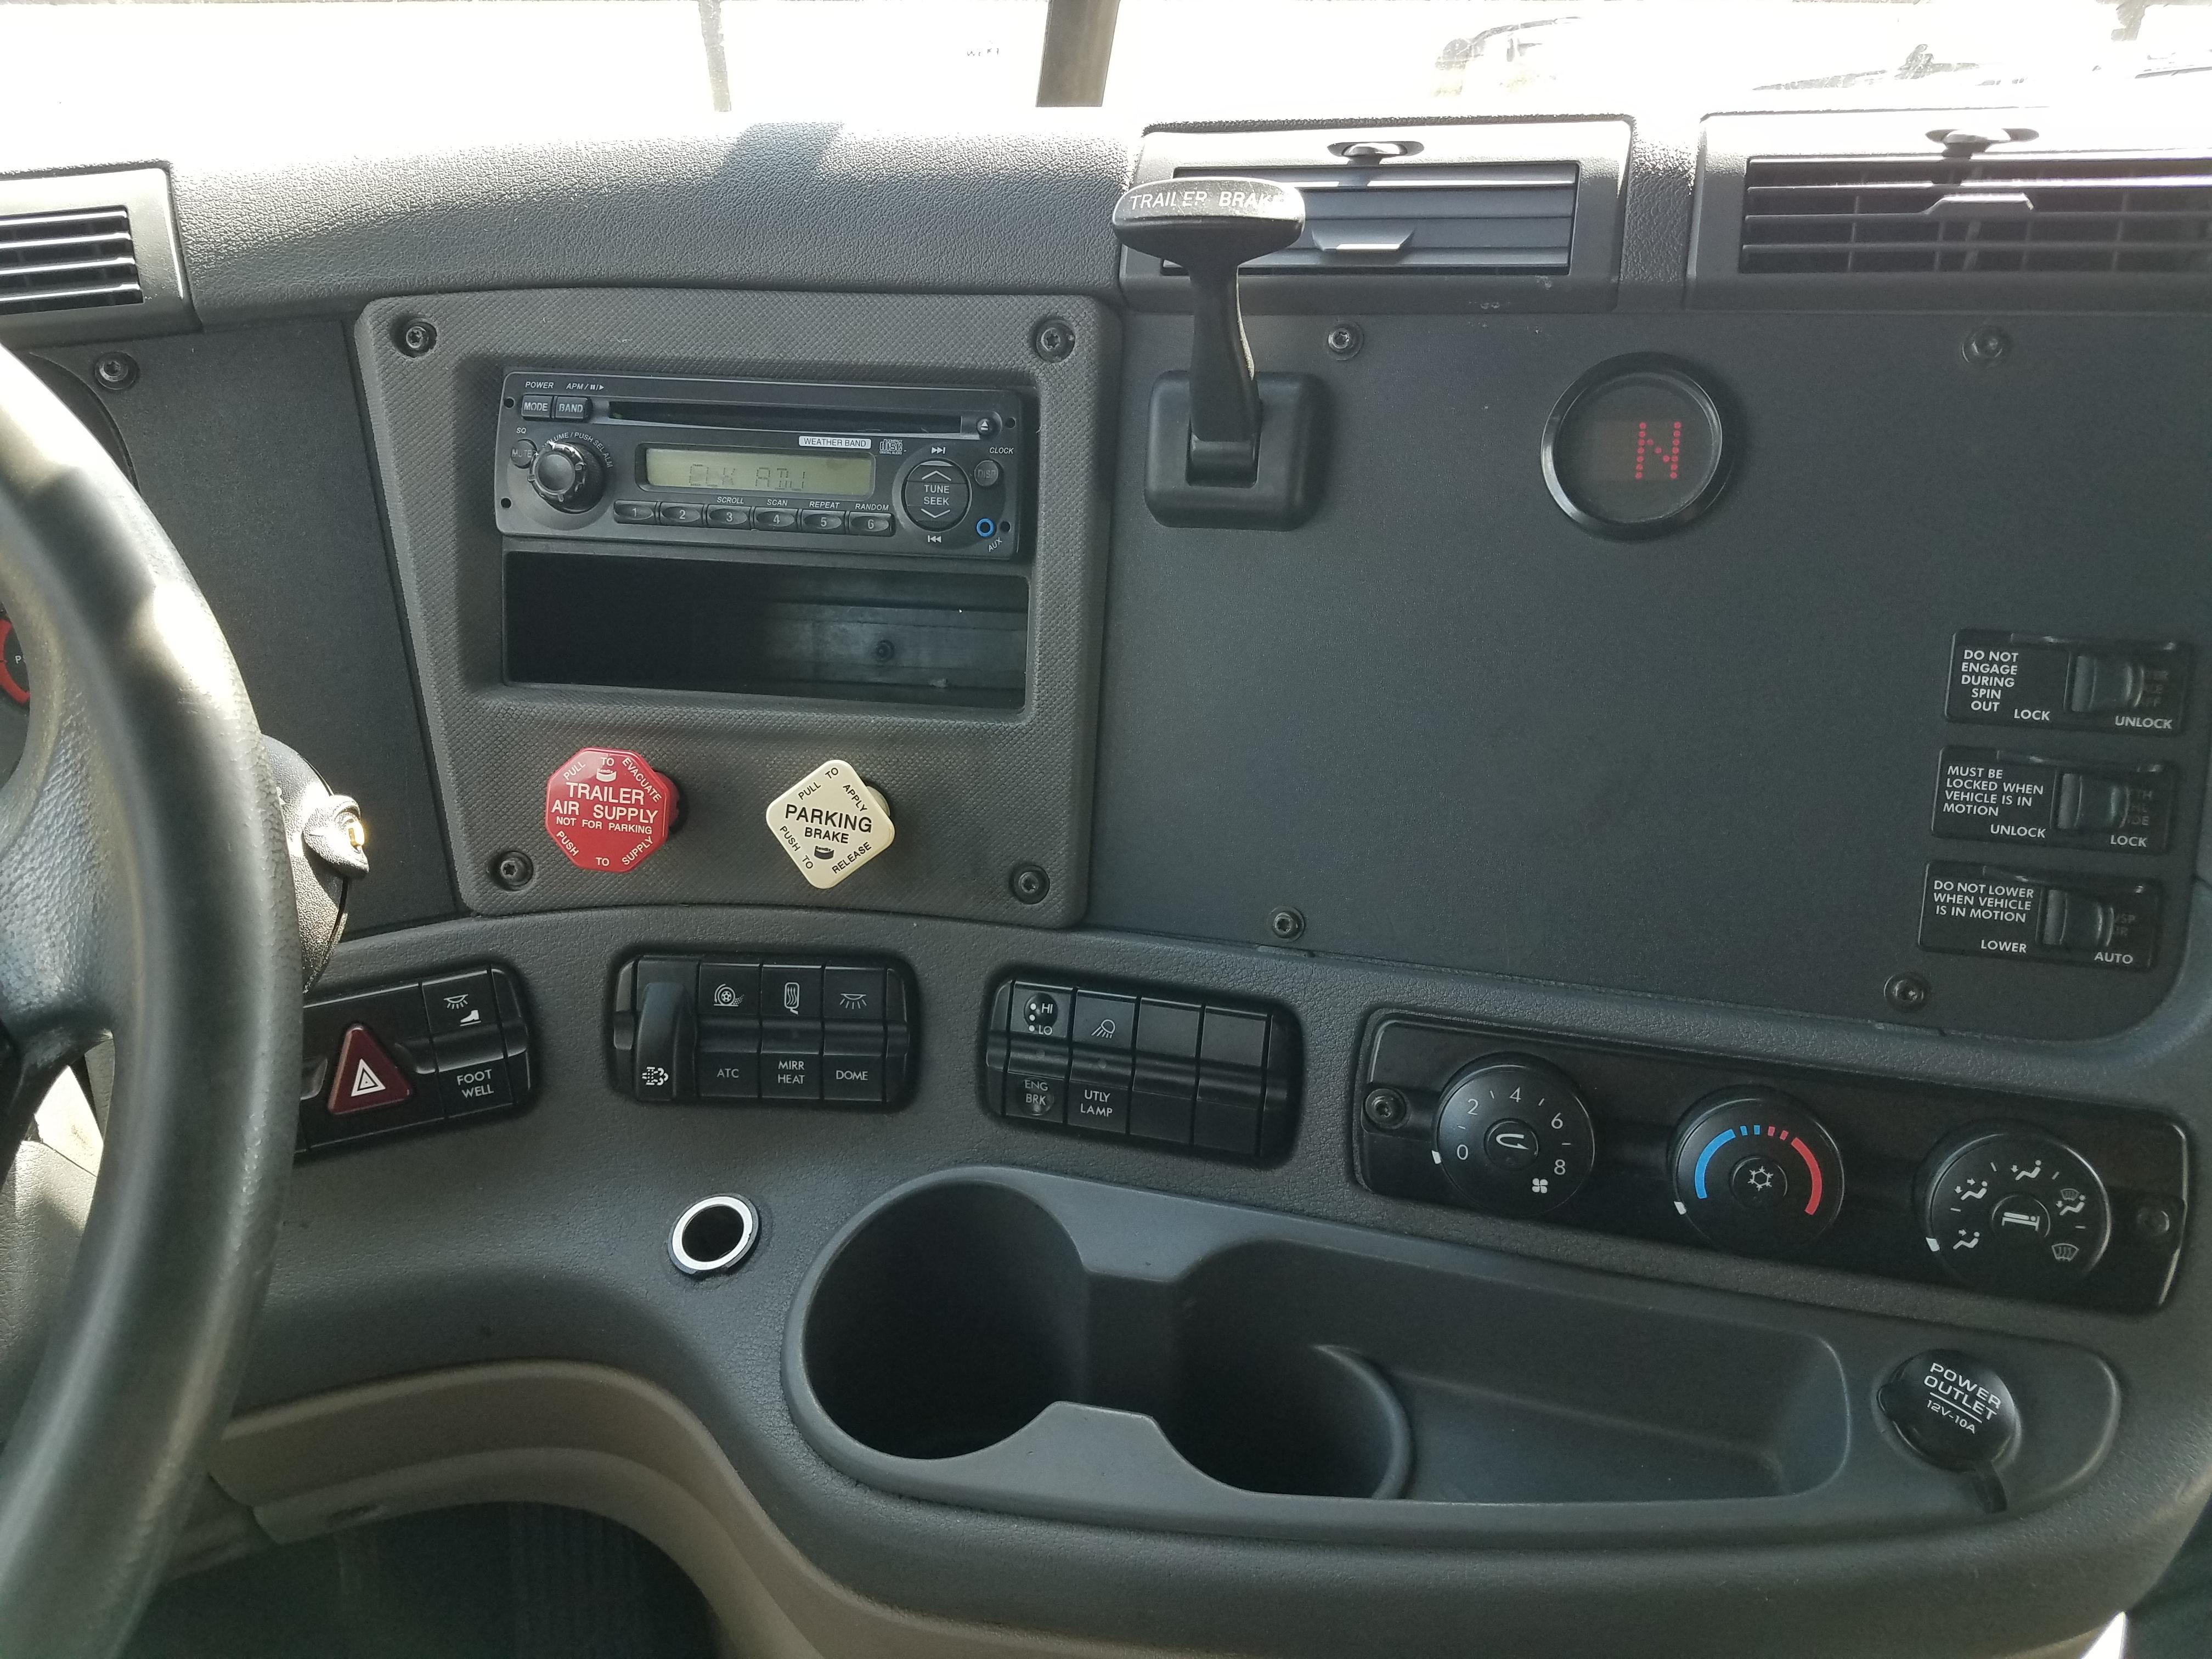 AW3263 (2)